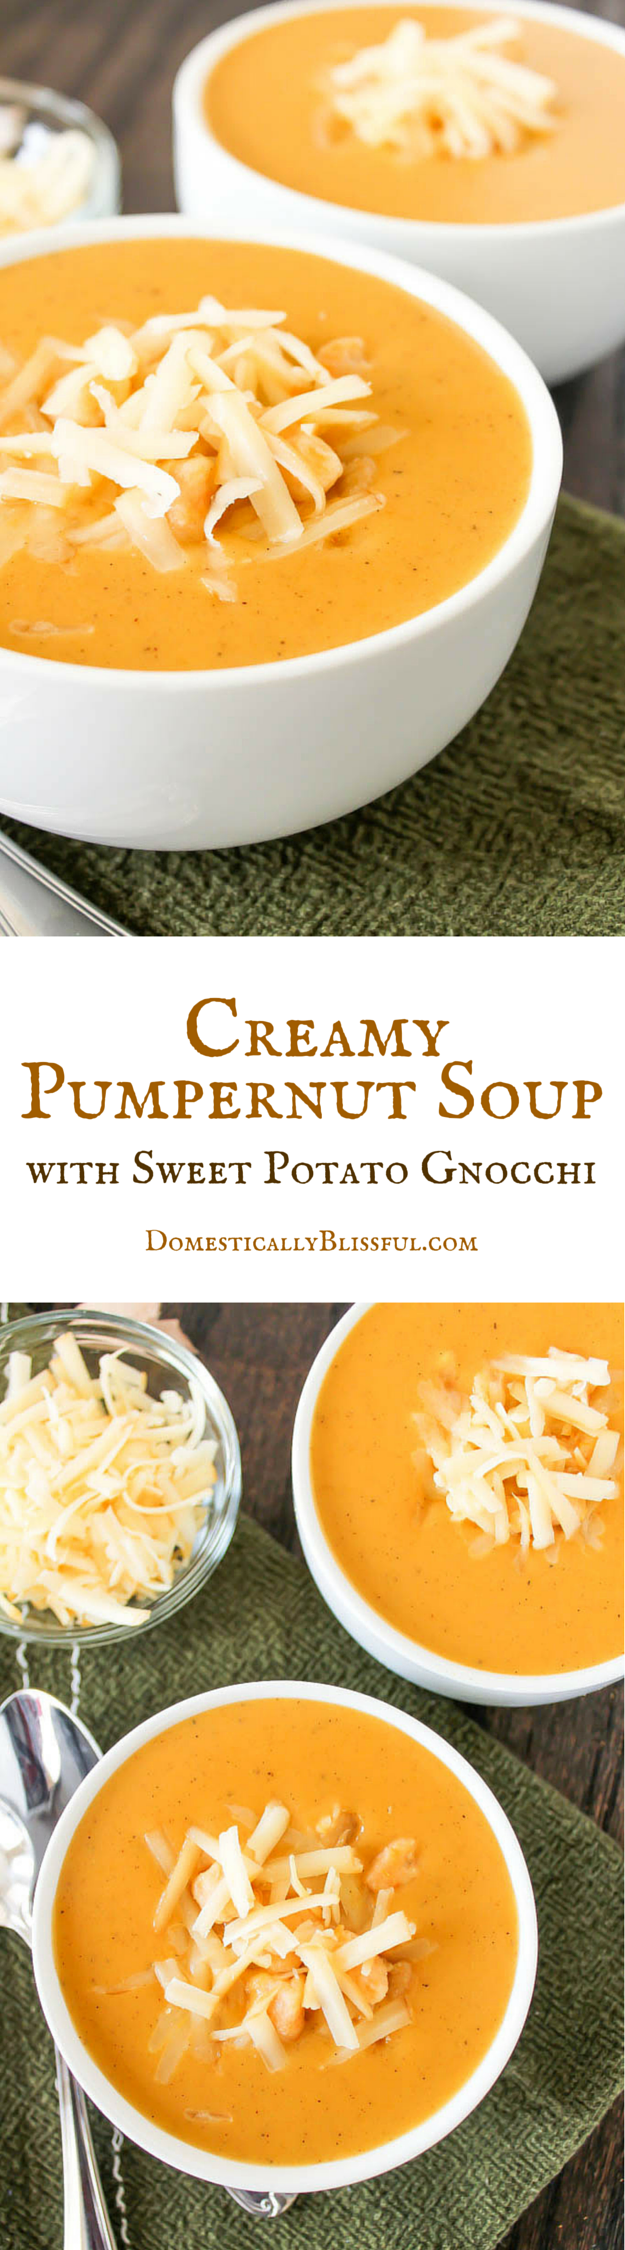 Creamy Pumpernut Soup recipe by Domestically Blissful